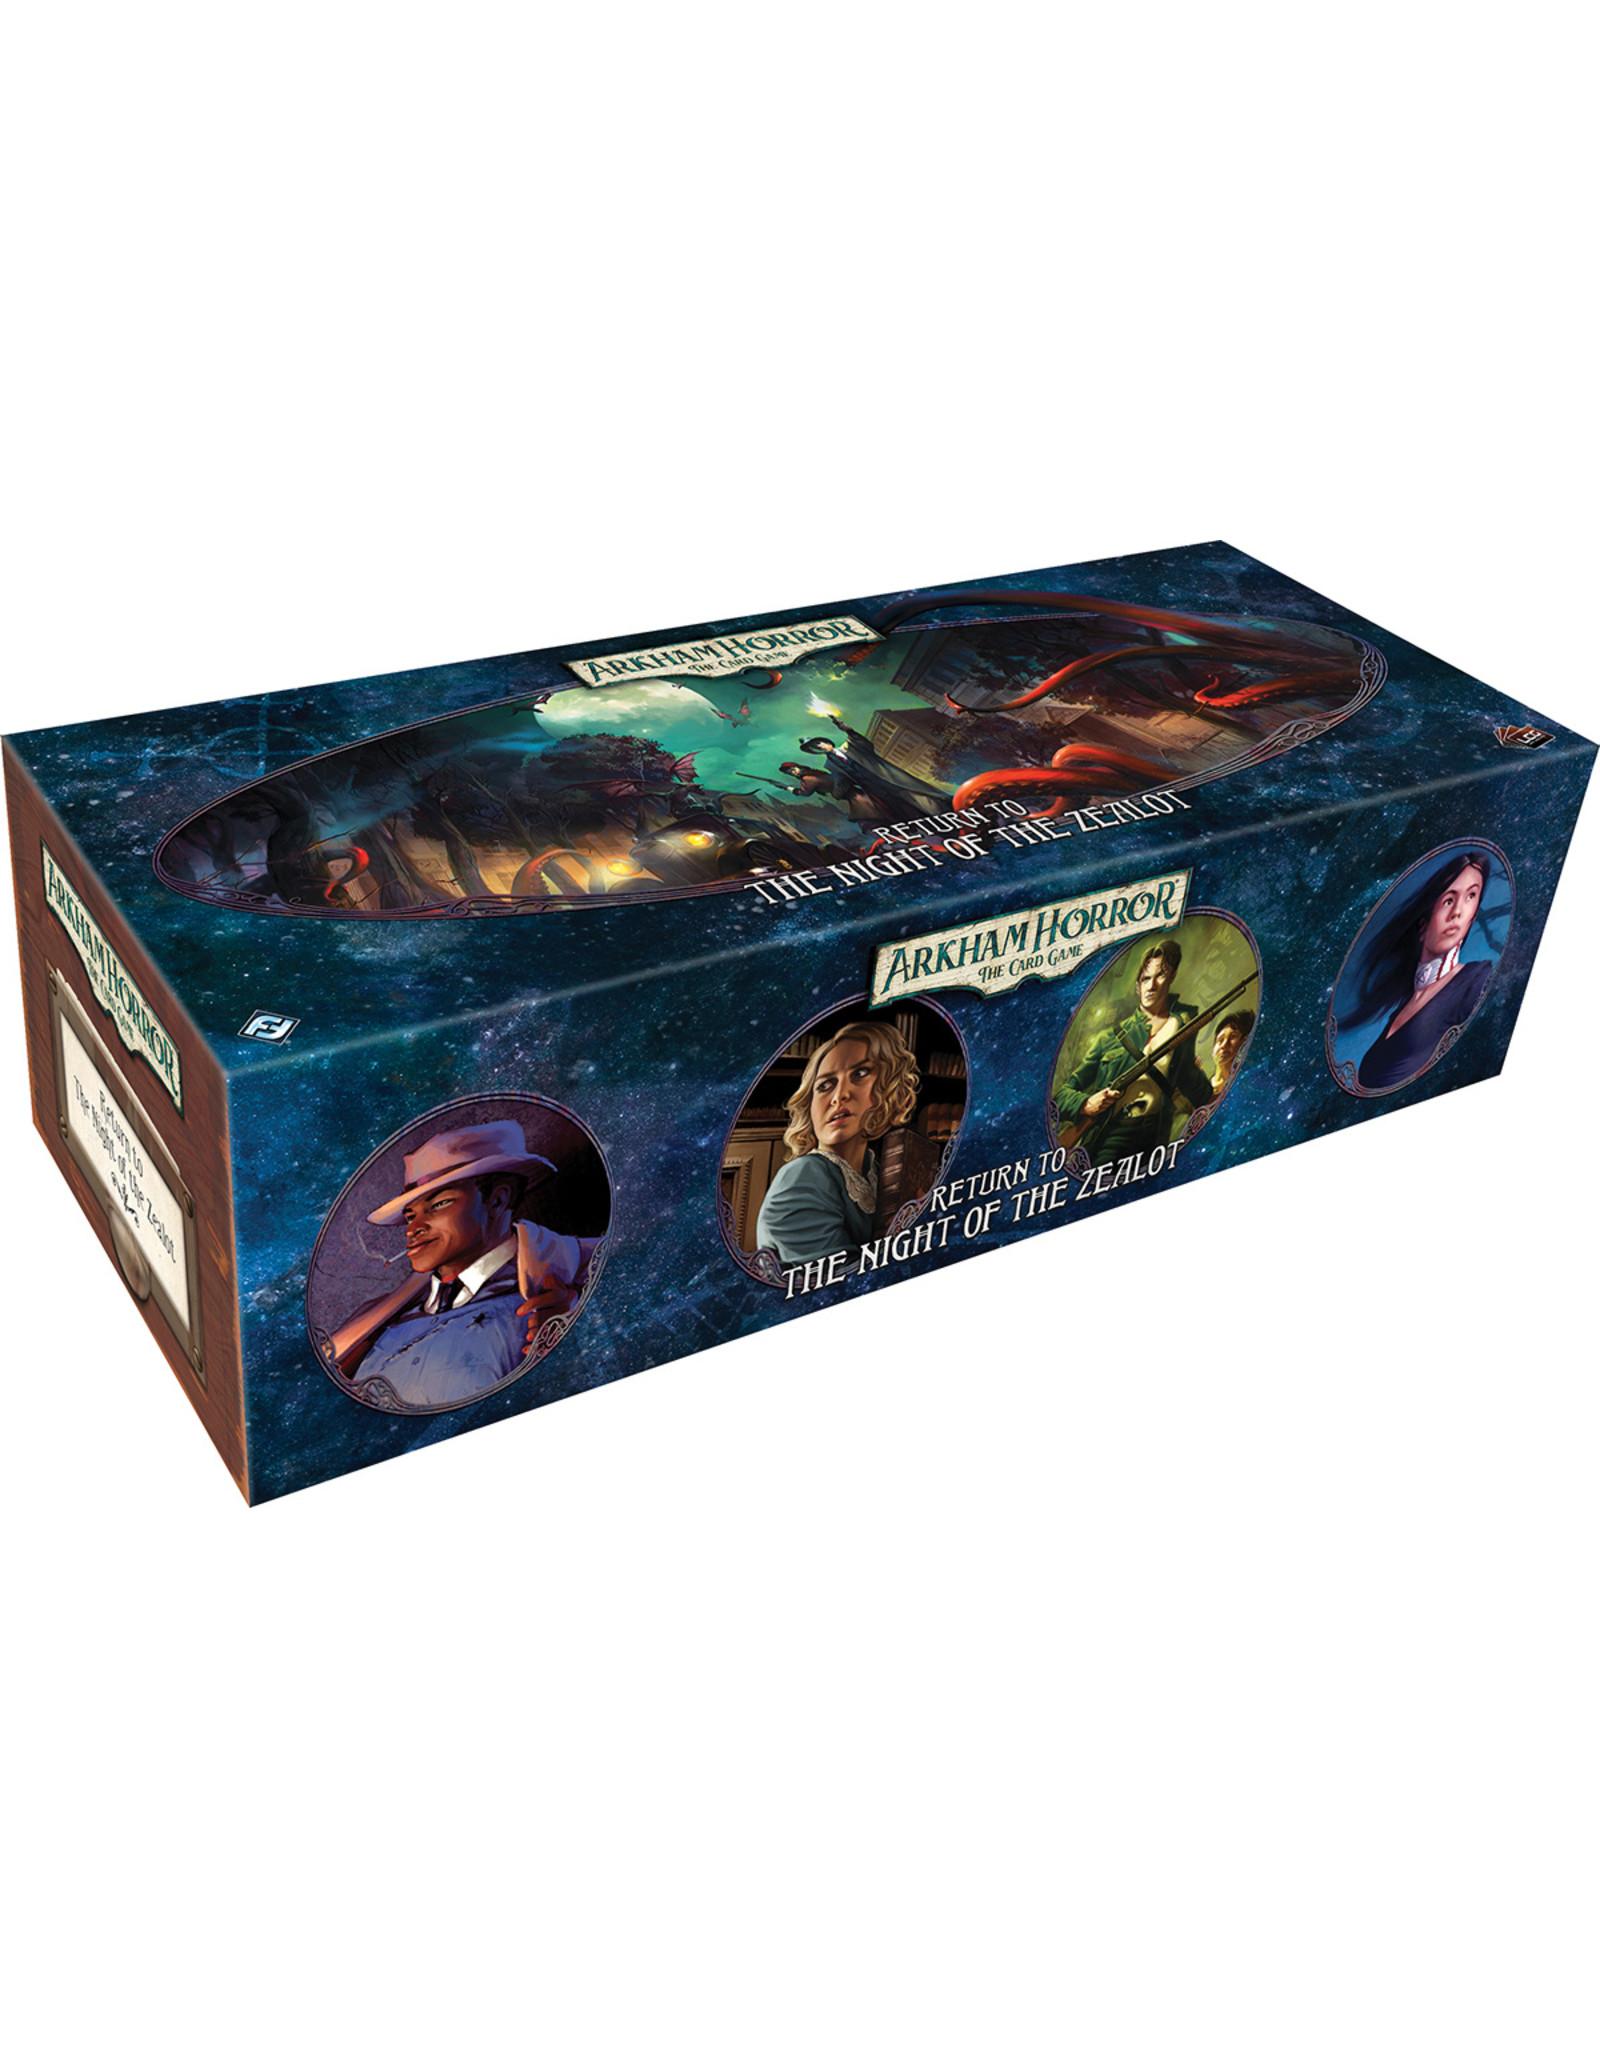 Fantasy Flight Games Arkham Horror LCG: Return of the Night of the Zealot